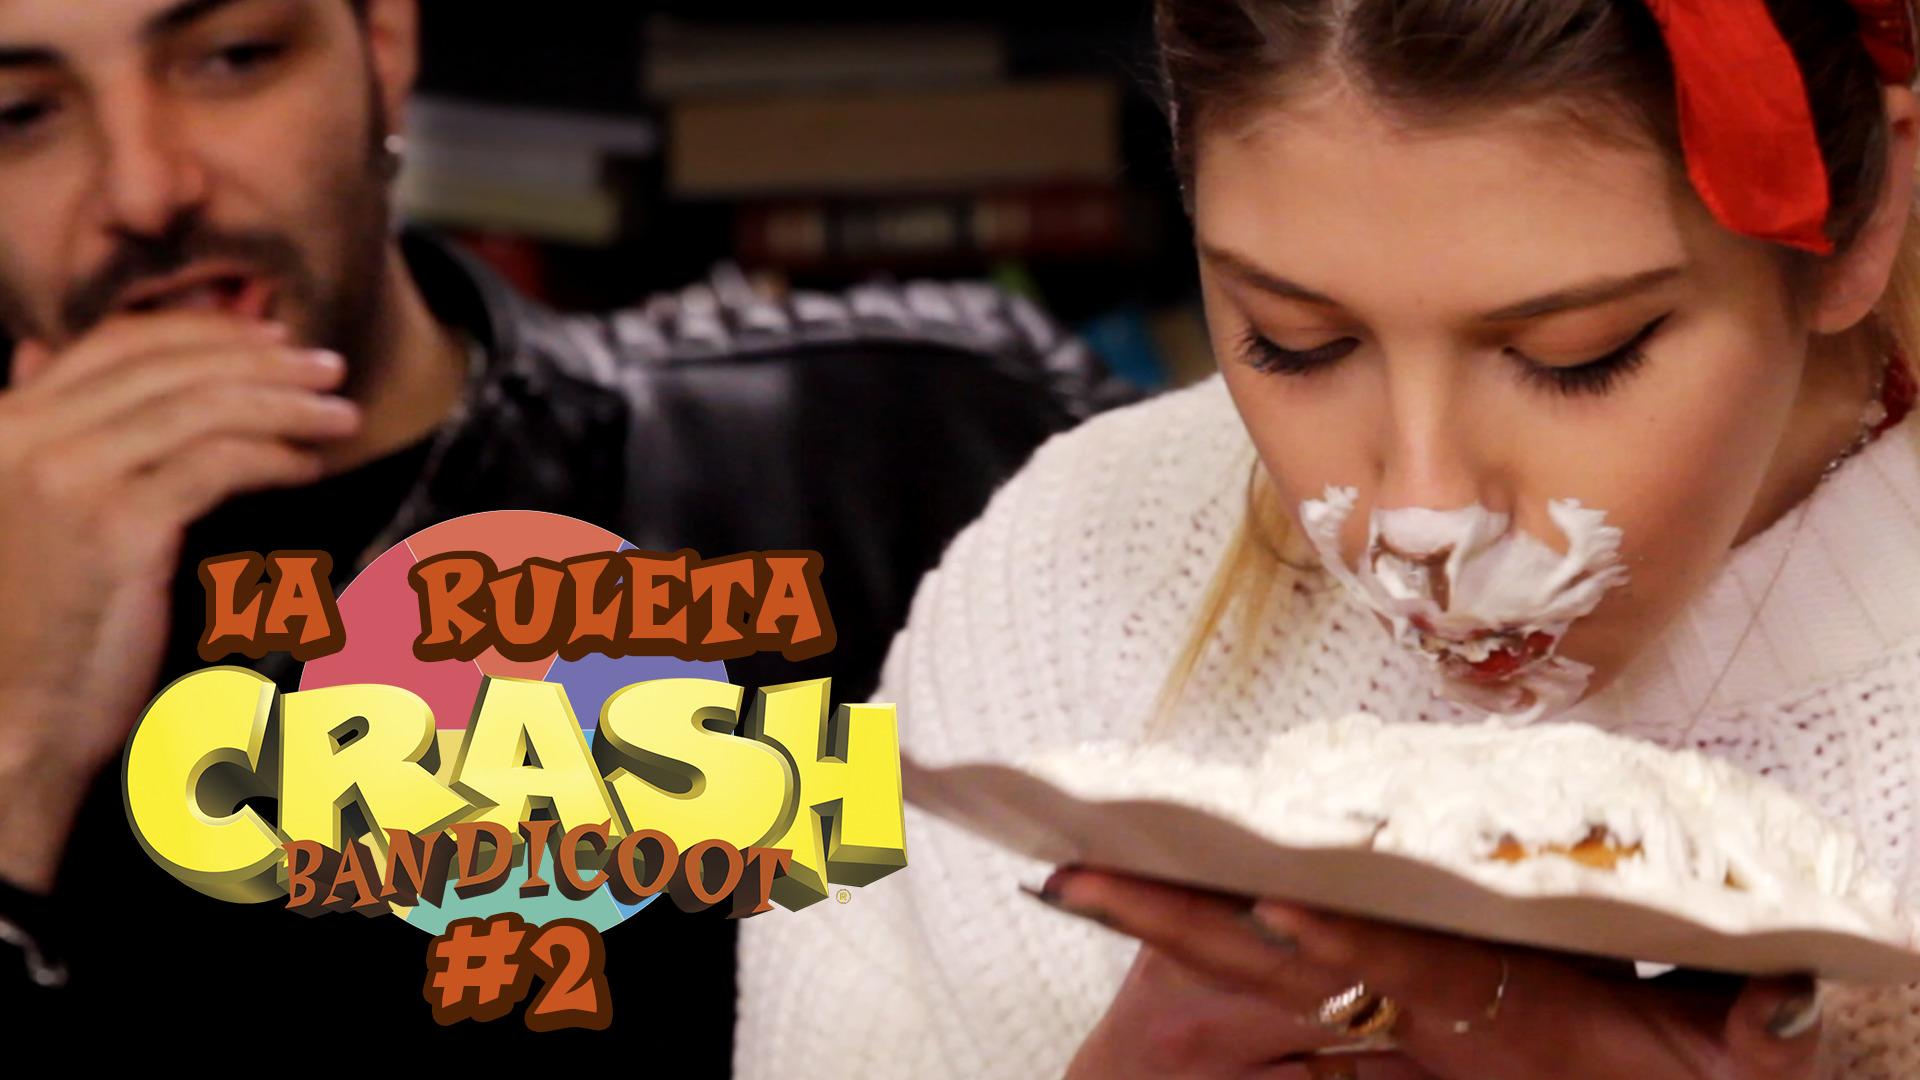 Temporada 2 Ruleta Bandicoot con NexxuzHD #2